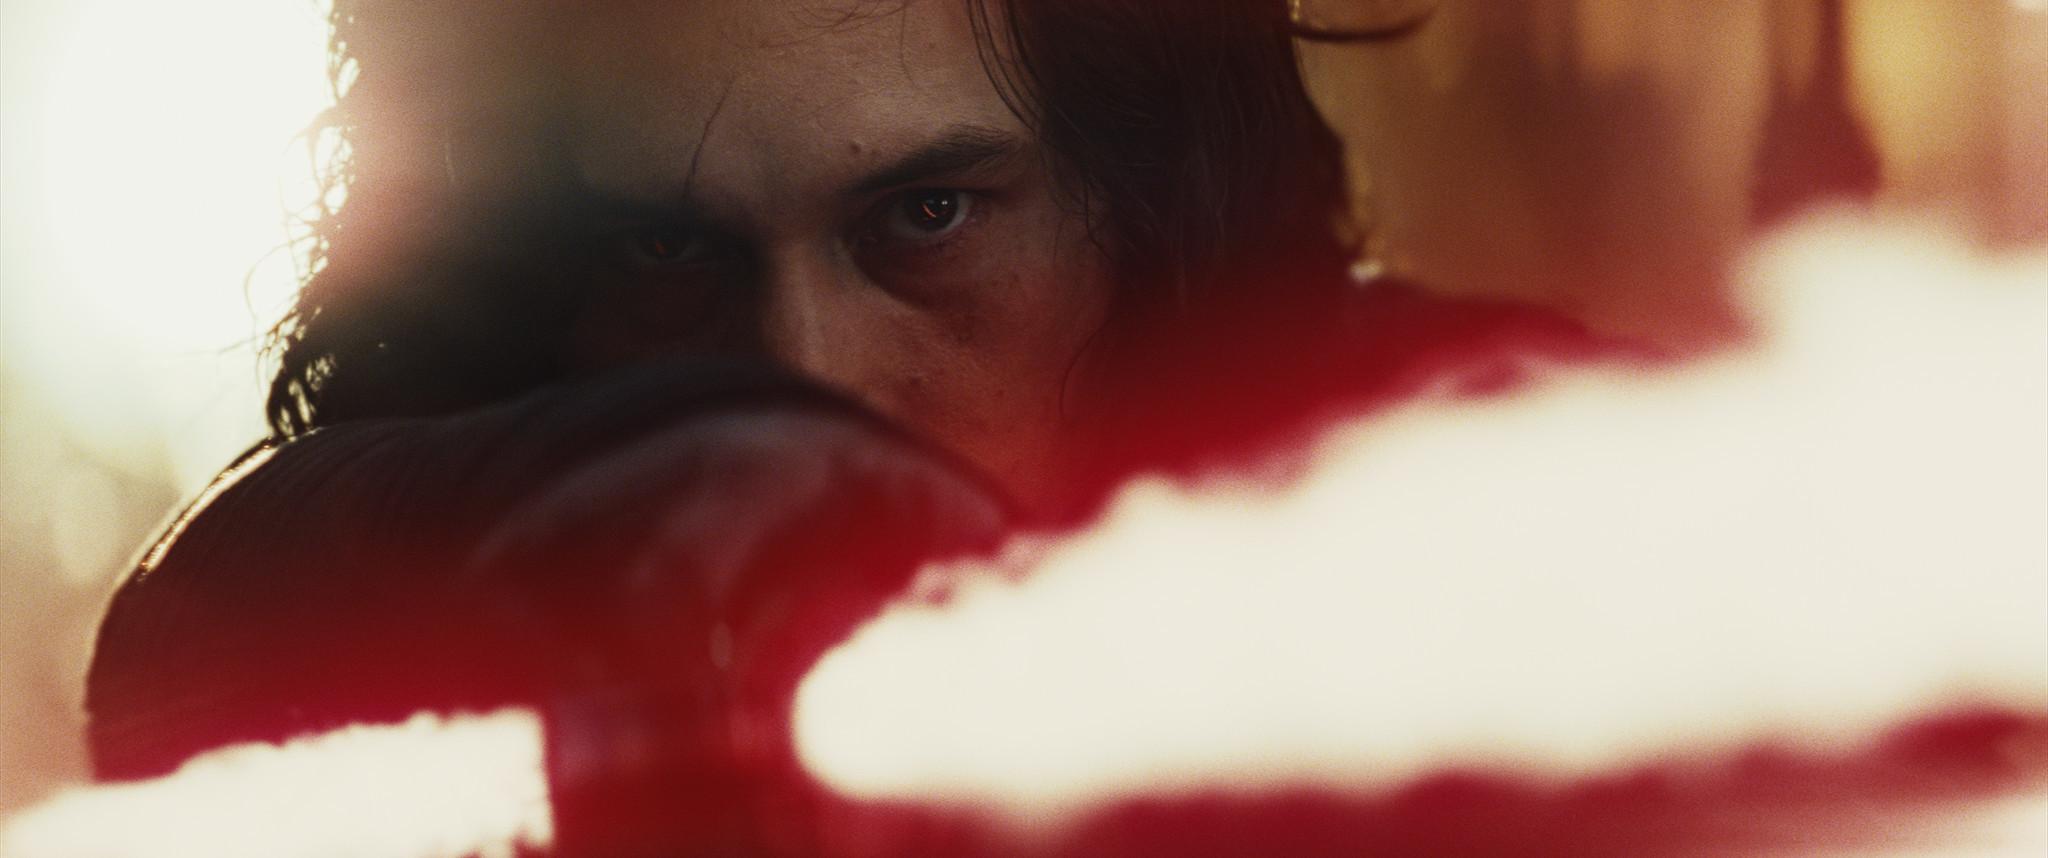 star-wars-the-last-jedi-trailer-20170414.jpg